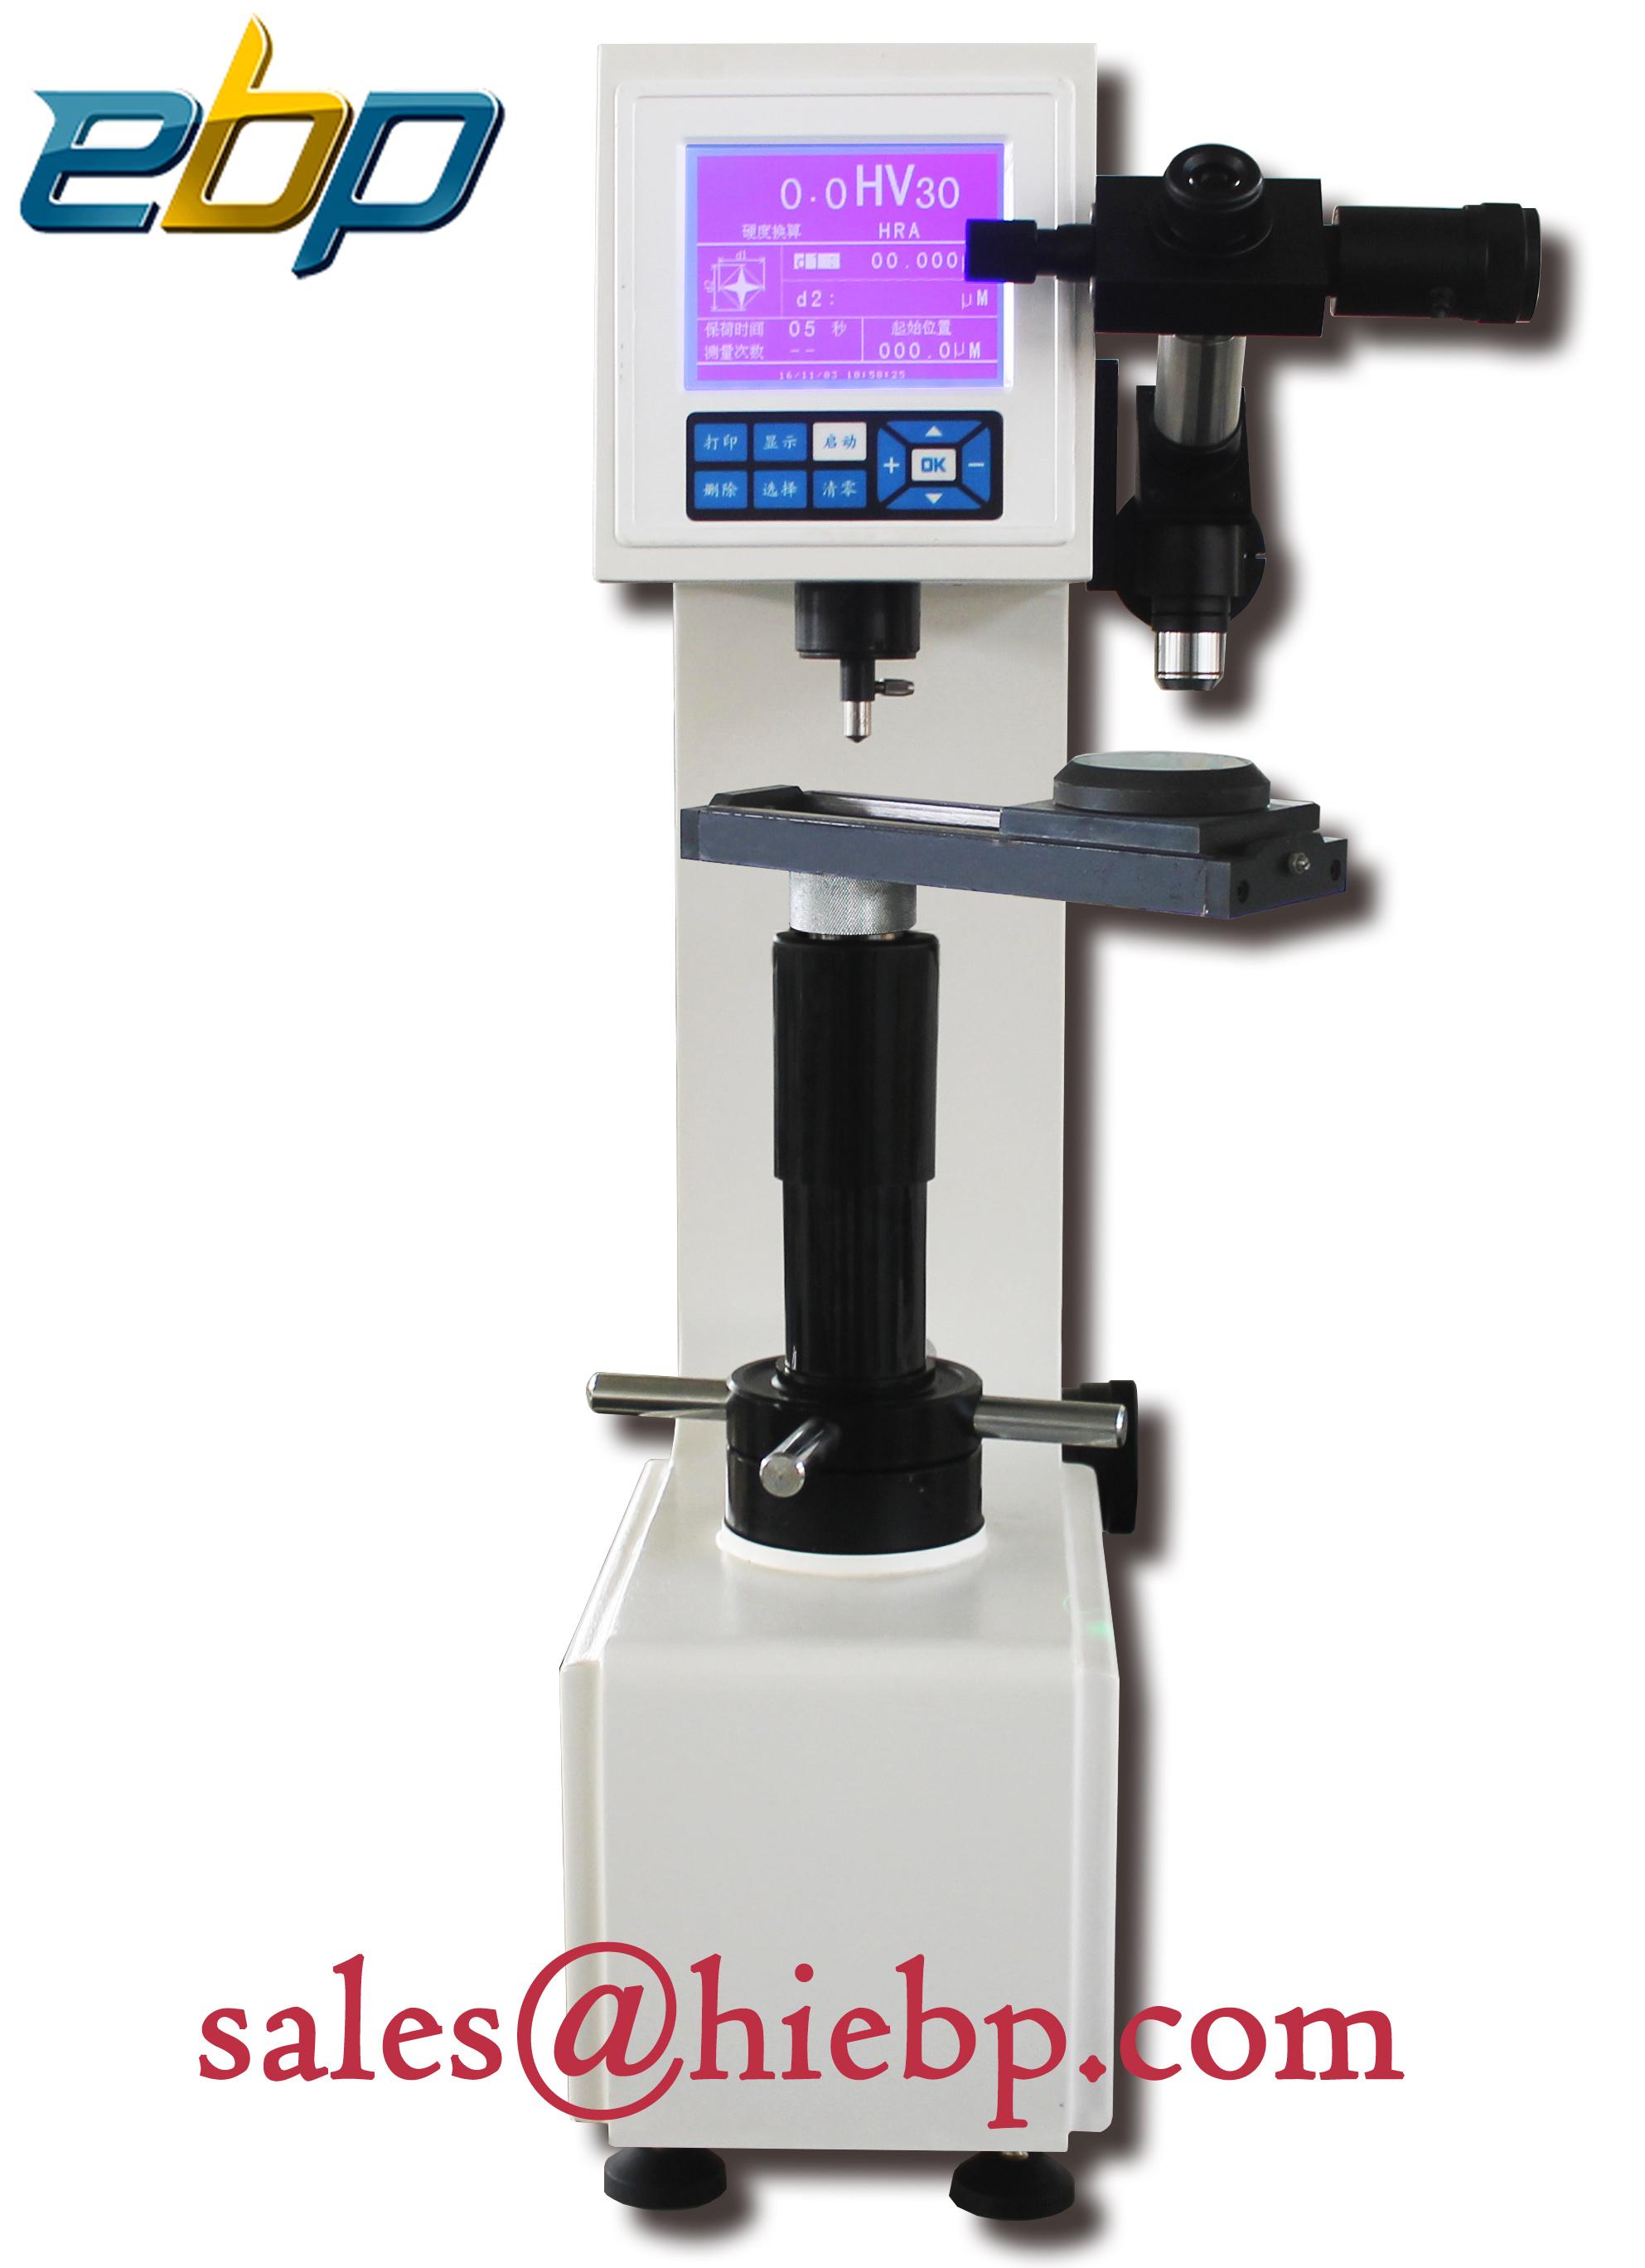 EBP Multifunction Digital Universal Brinell cum Rockwell cum Vickers hardness tester BRV-187.5D